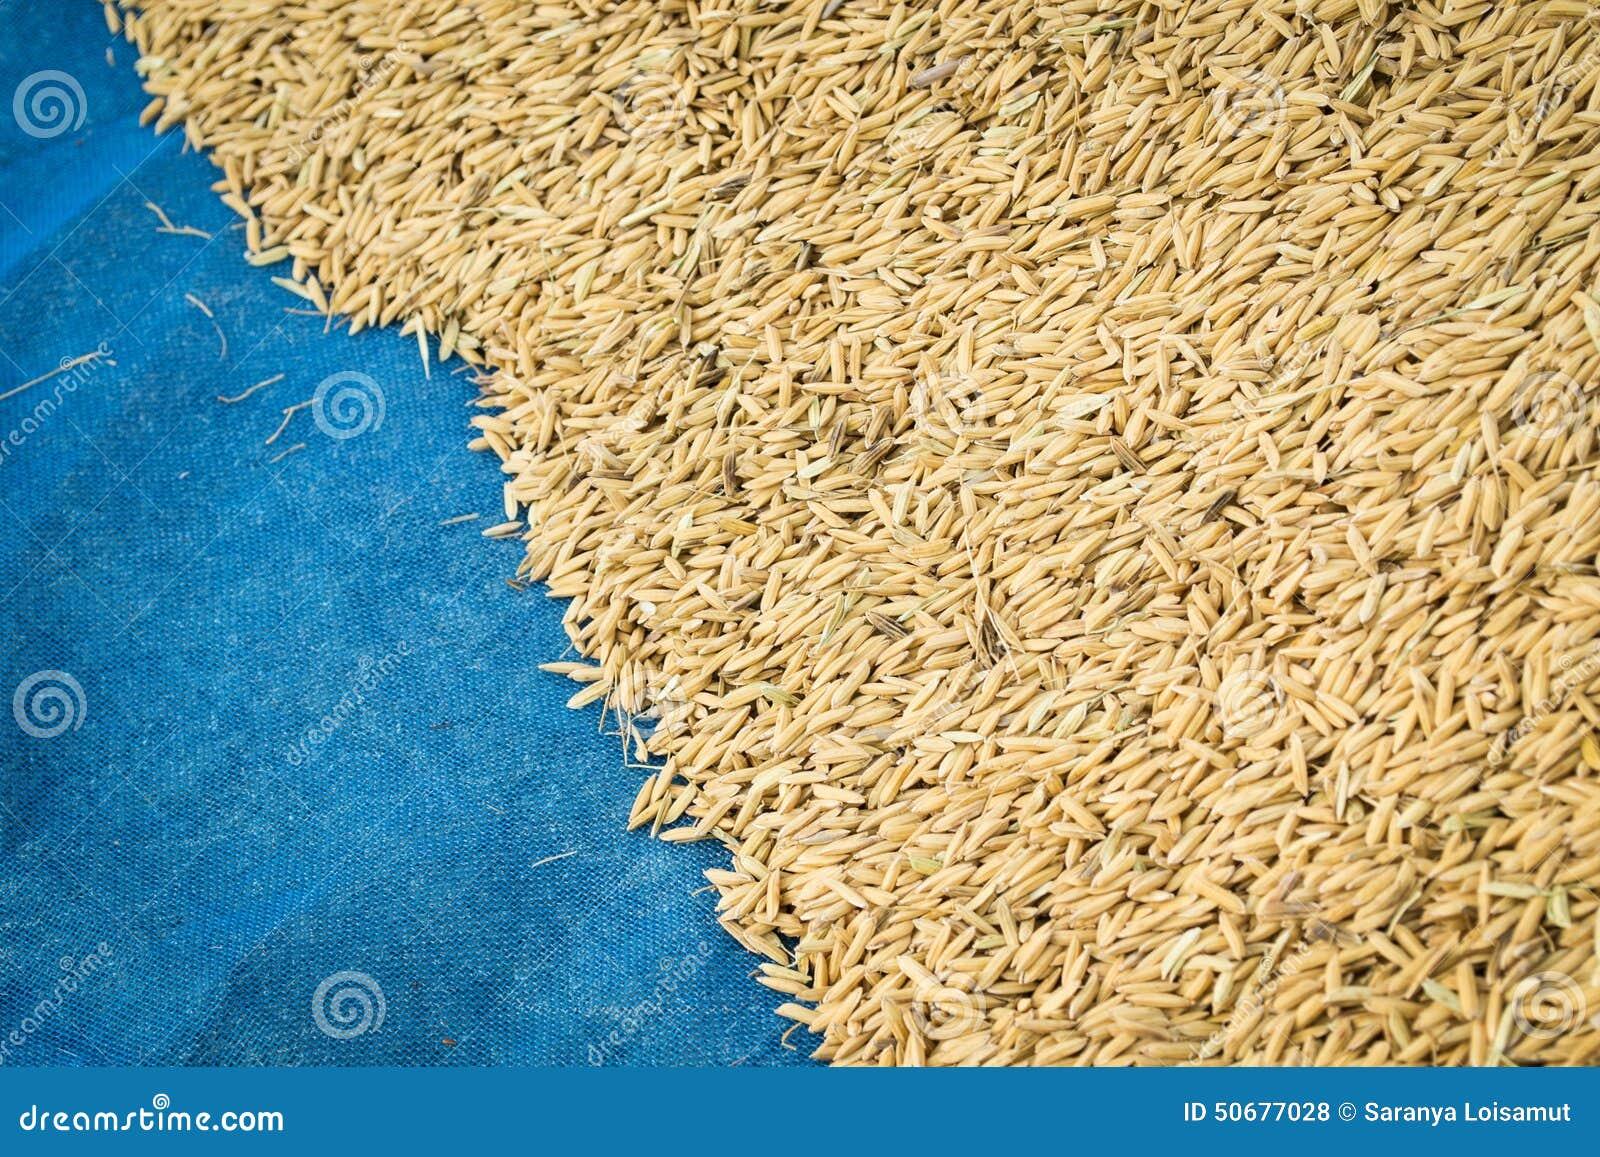 Download 水稻 库存照片. 图片 包括有 沙漠, 特写镜头, beauvoir, 食物, 充分, 阿尔卑斯, 气候 - 50677028